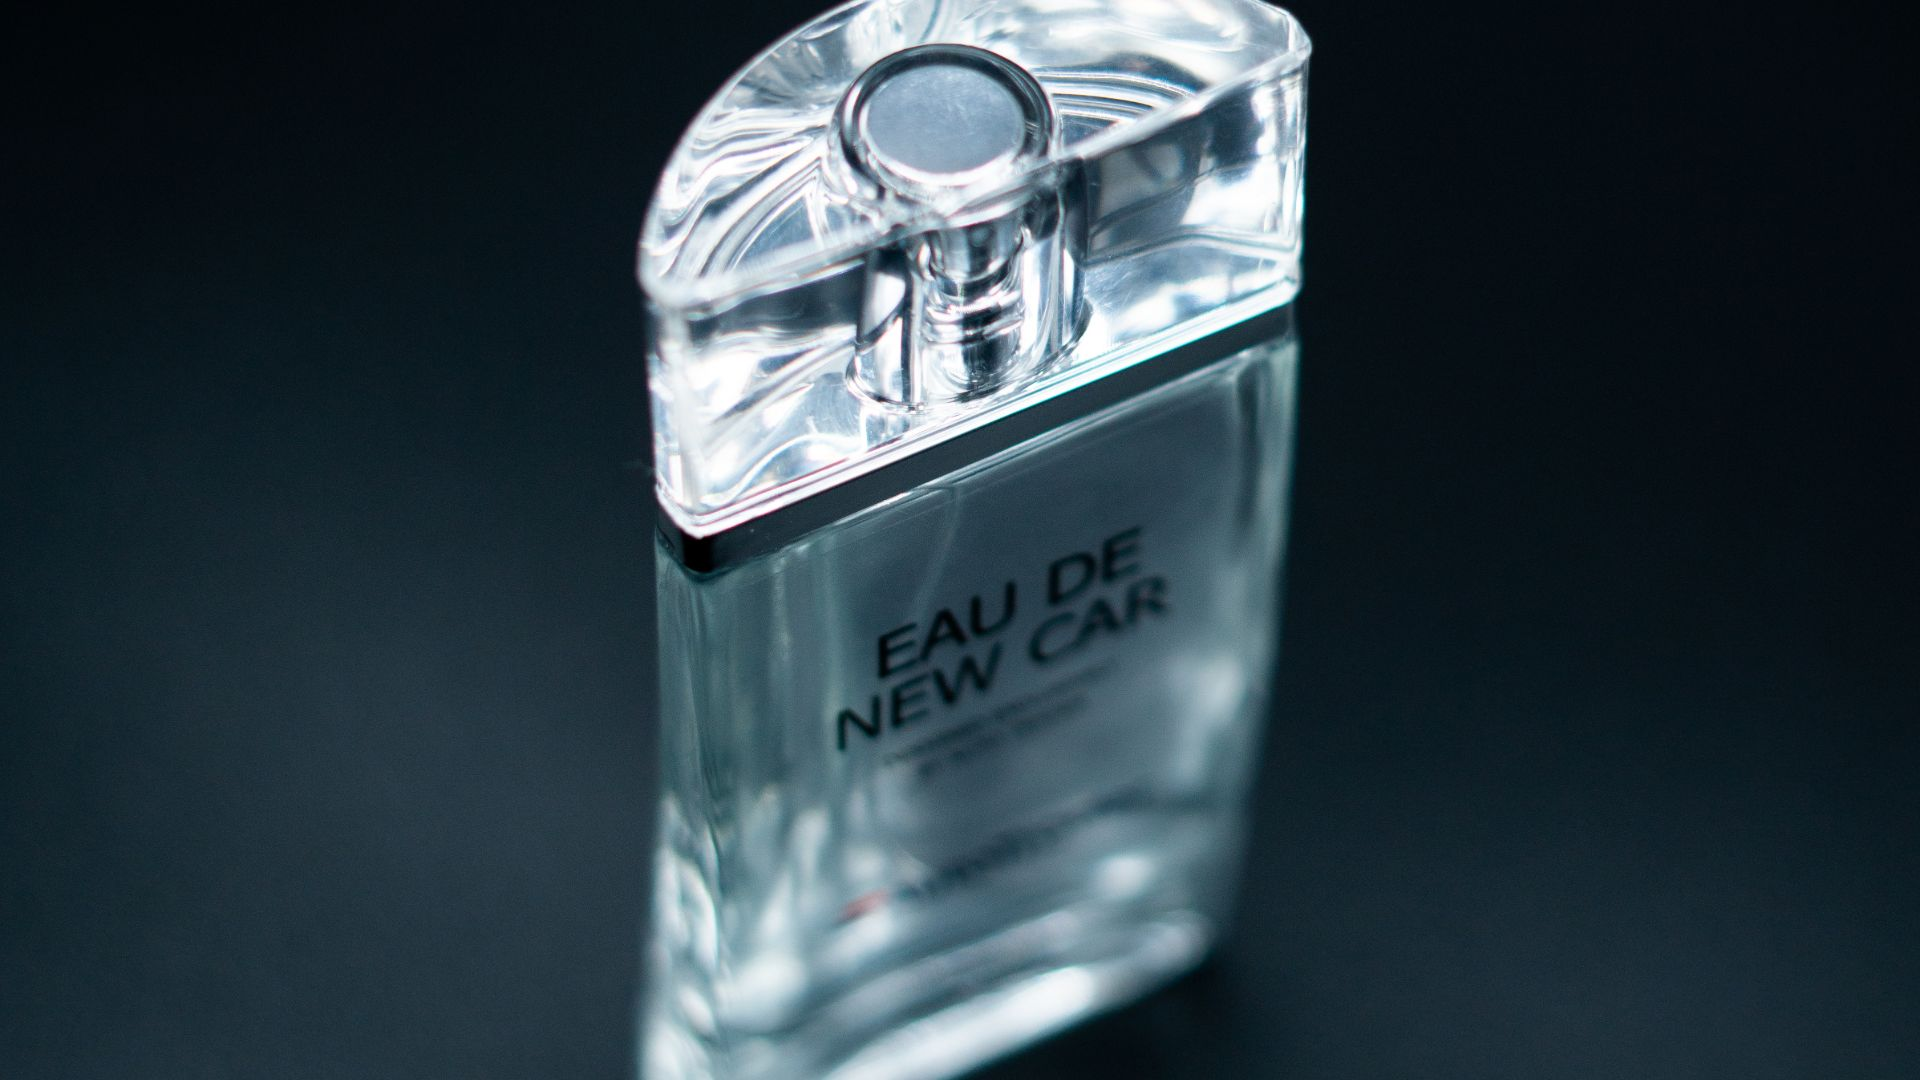 Auto Trader Au de New Car fragrance